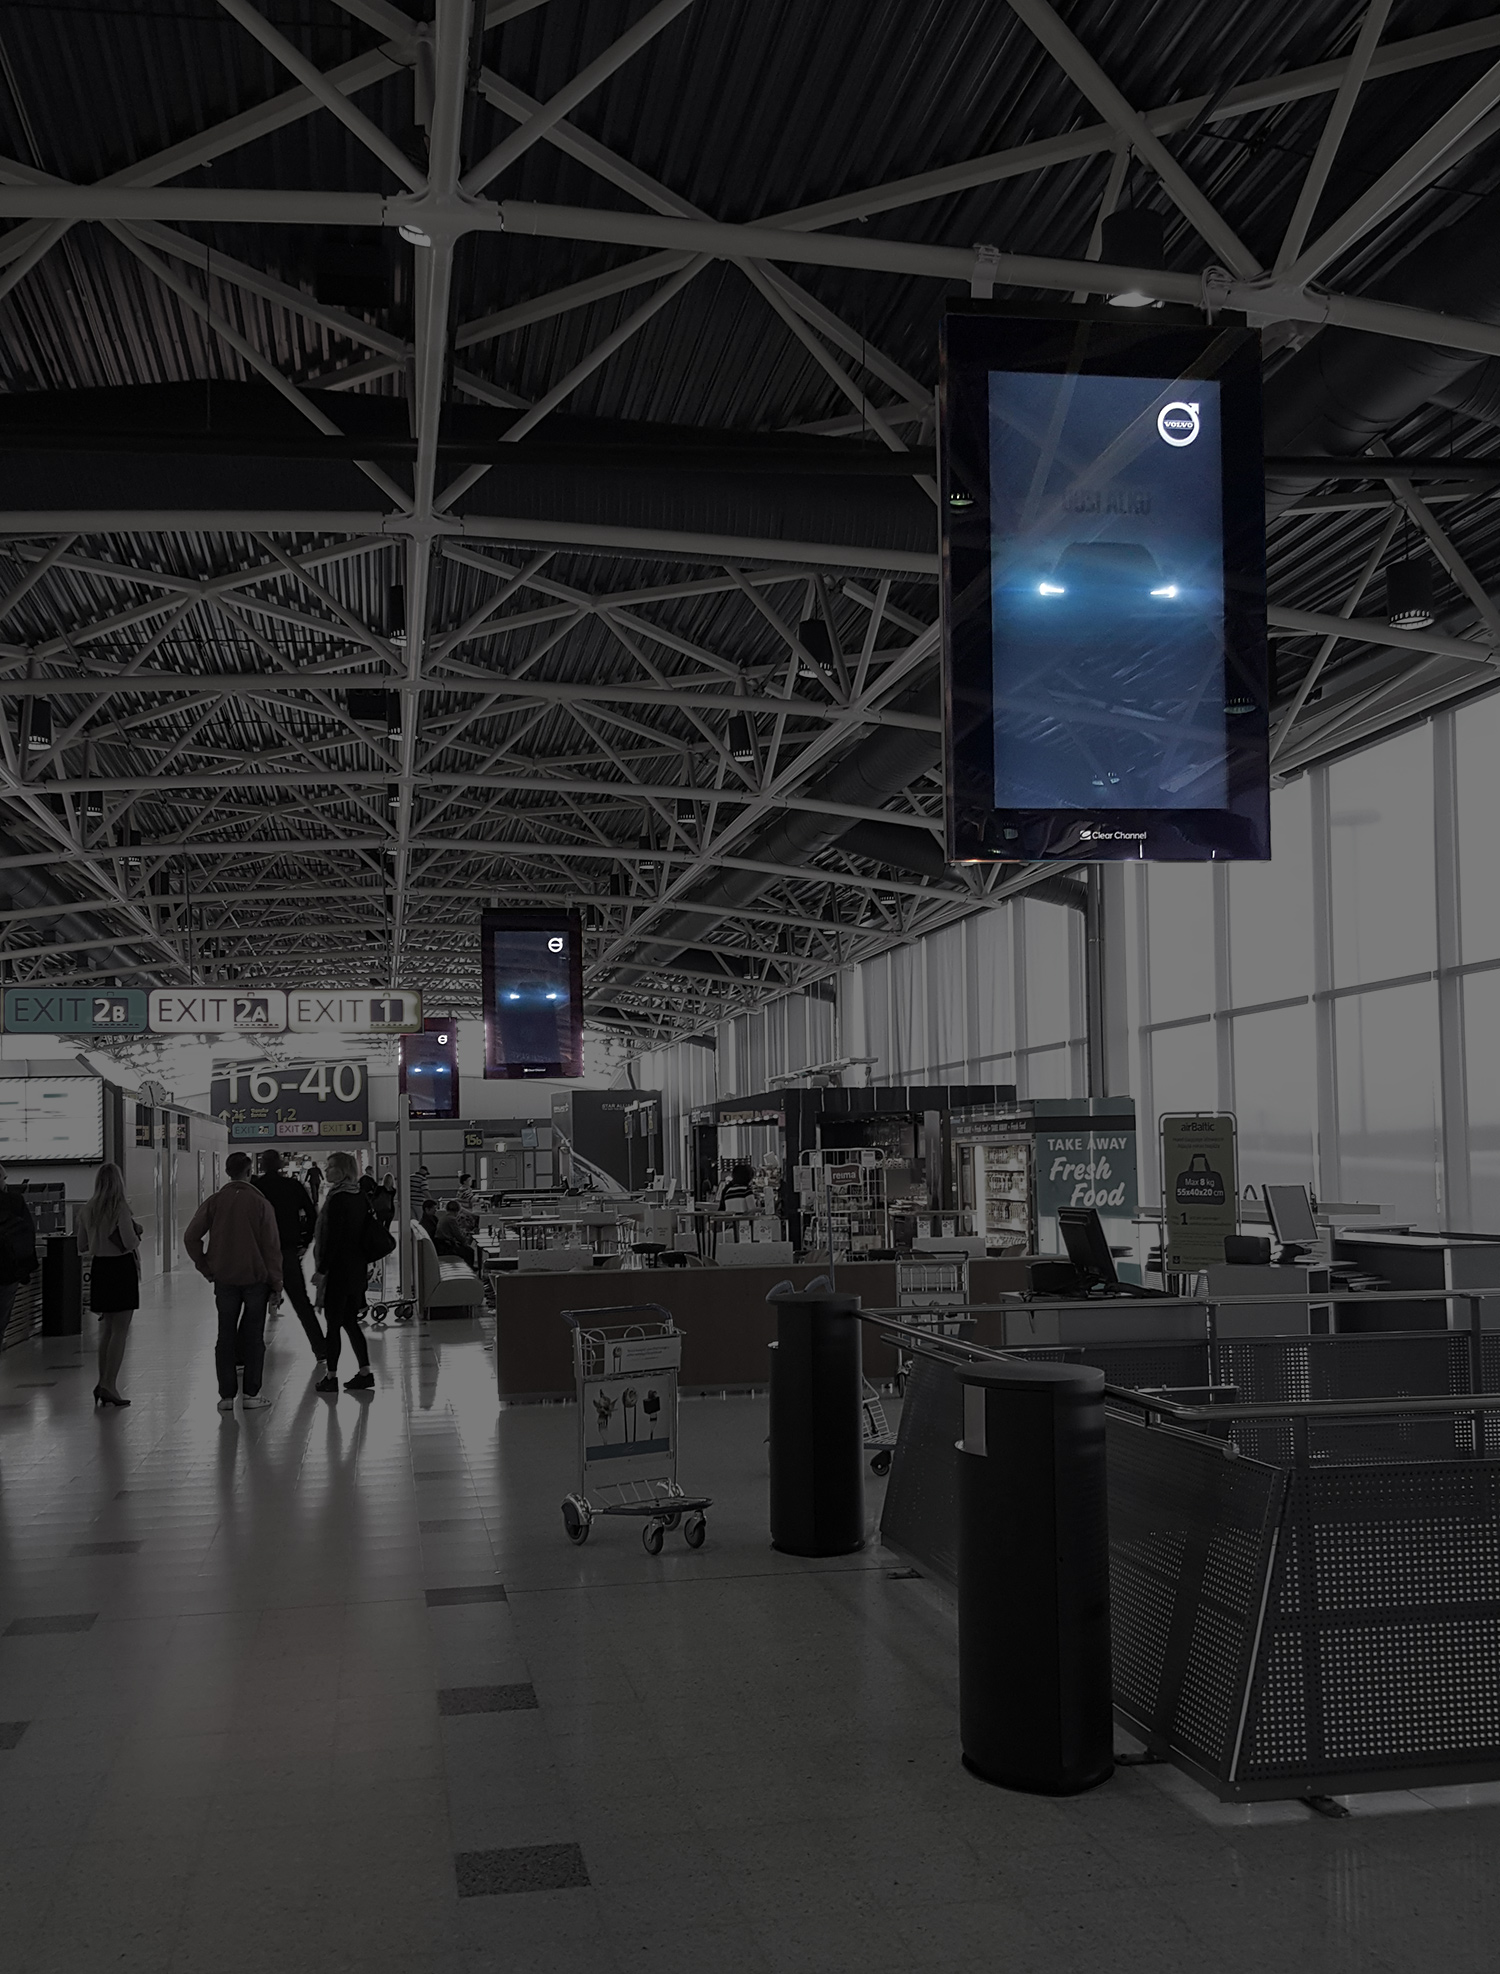 Volvo XC90 Airport